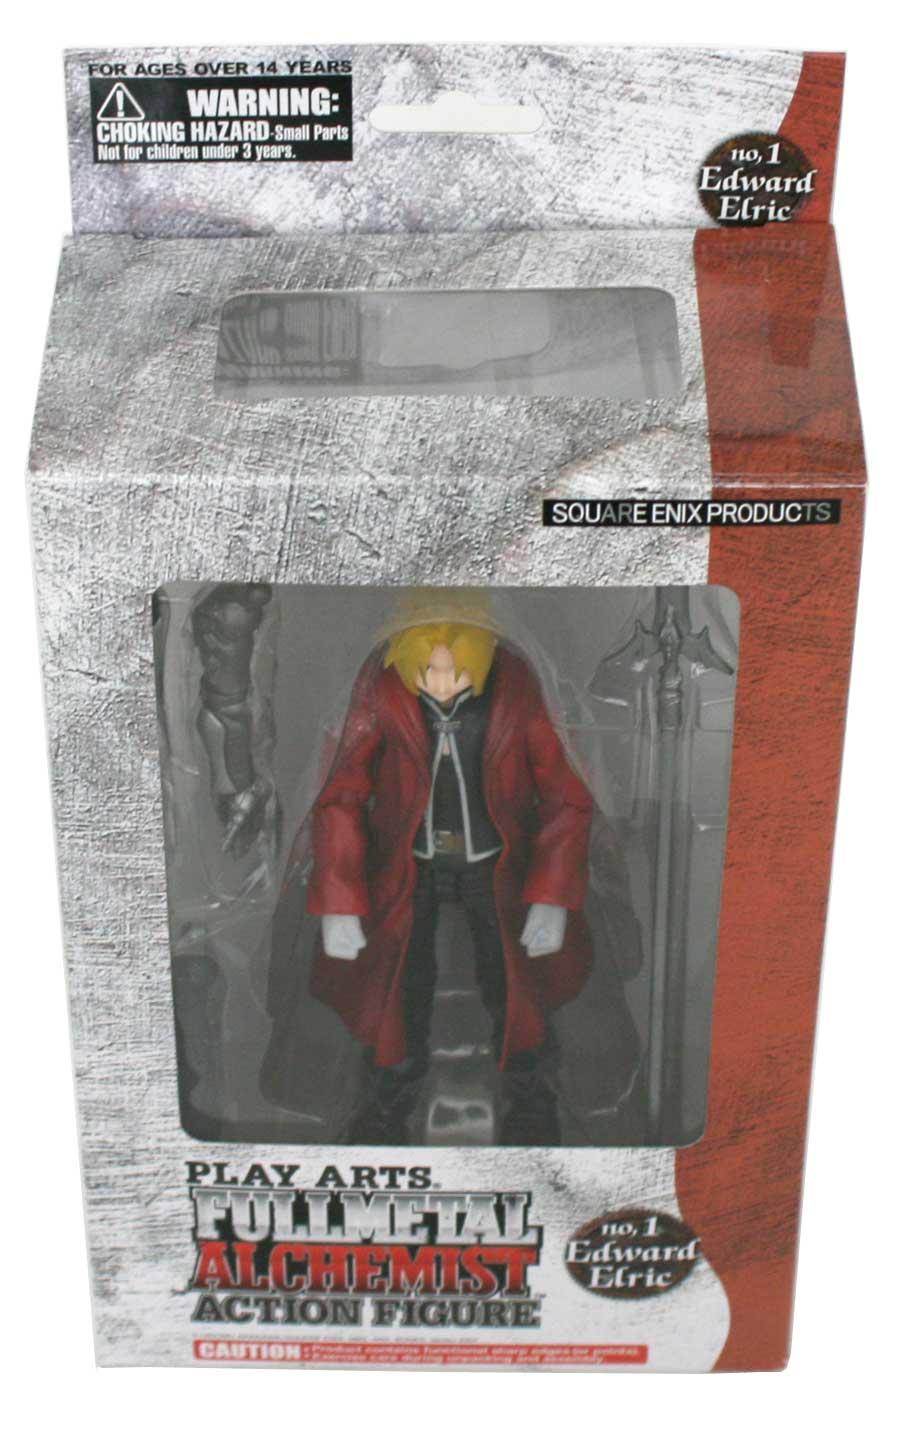 Edward Elric : Action Figurine - (Fullmetal Alchemist - 2008)